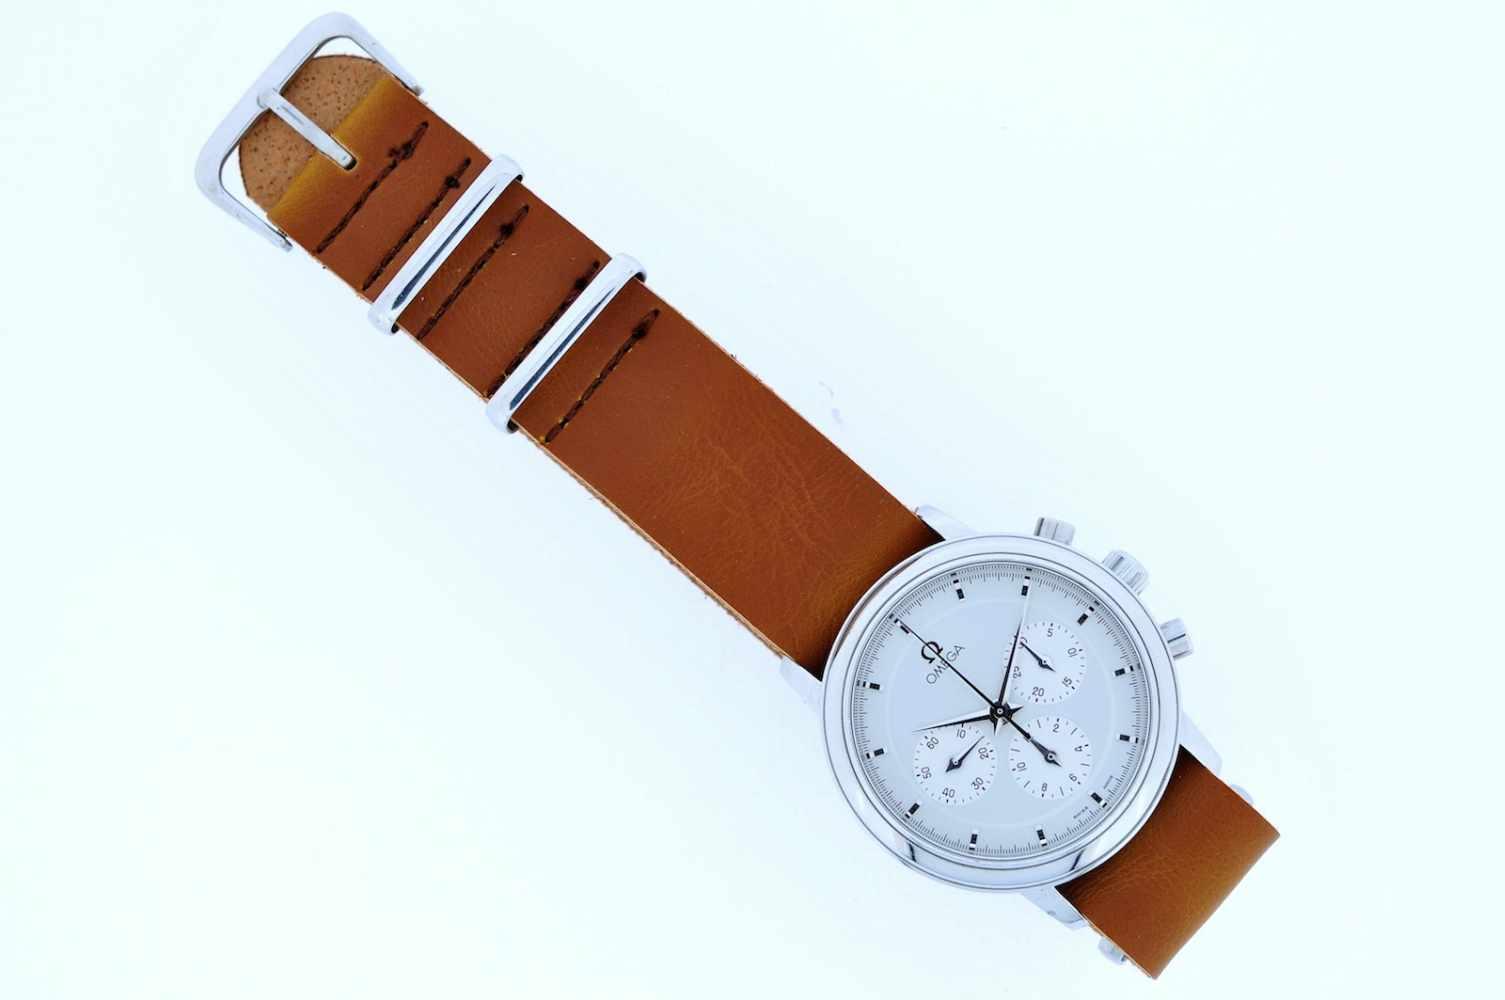 Omega Edelstahl Armbanduhr an Lederband, Omega, Chronograph, Stoppfunktion, Kaliber 861, Handaufzug,